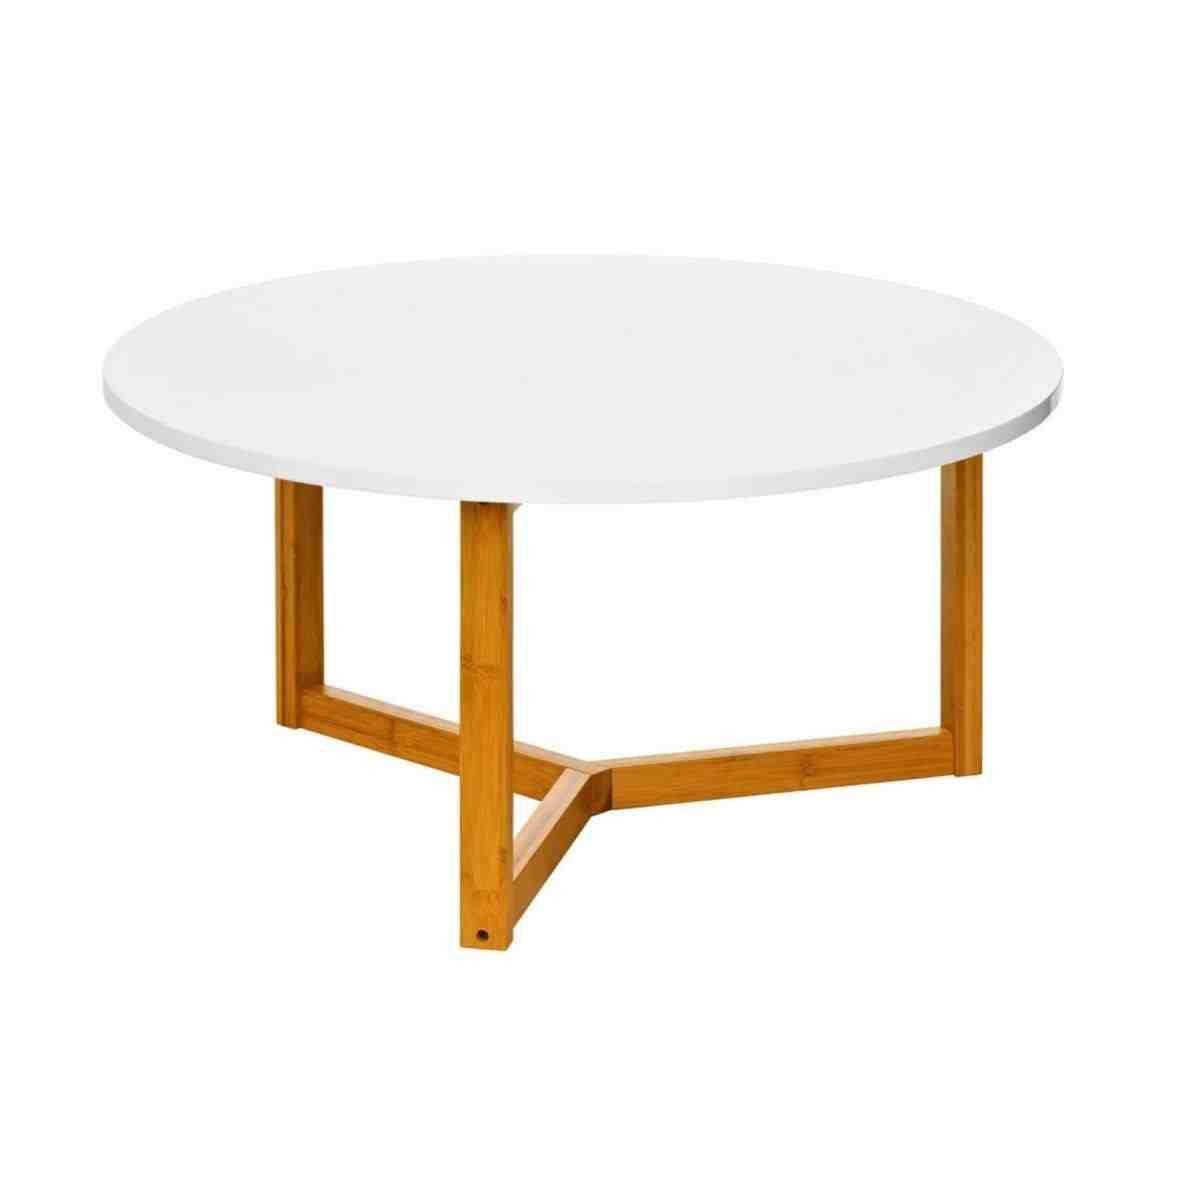 Coffee Table With Bamboo Legs 2260 Tafel Ovaal A Legs Gemaakt Van Bamboo Arp Design Topic Related Coffee Table Contemporary Side Tables Coffee Table Wood [ 1185 x 1185 Pixel ]